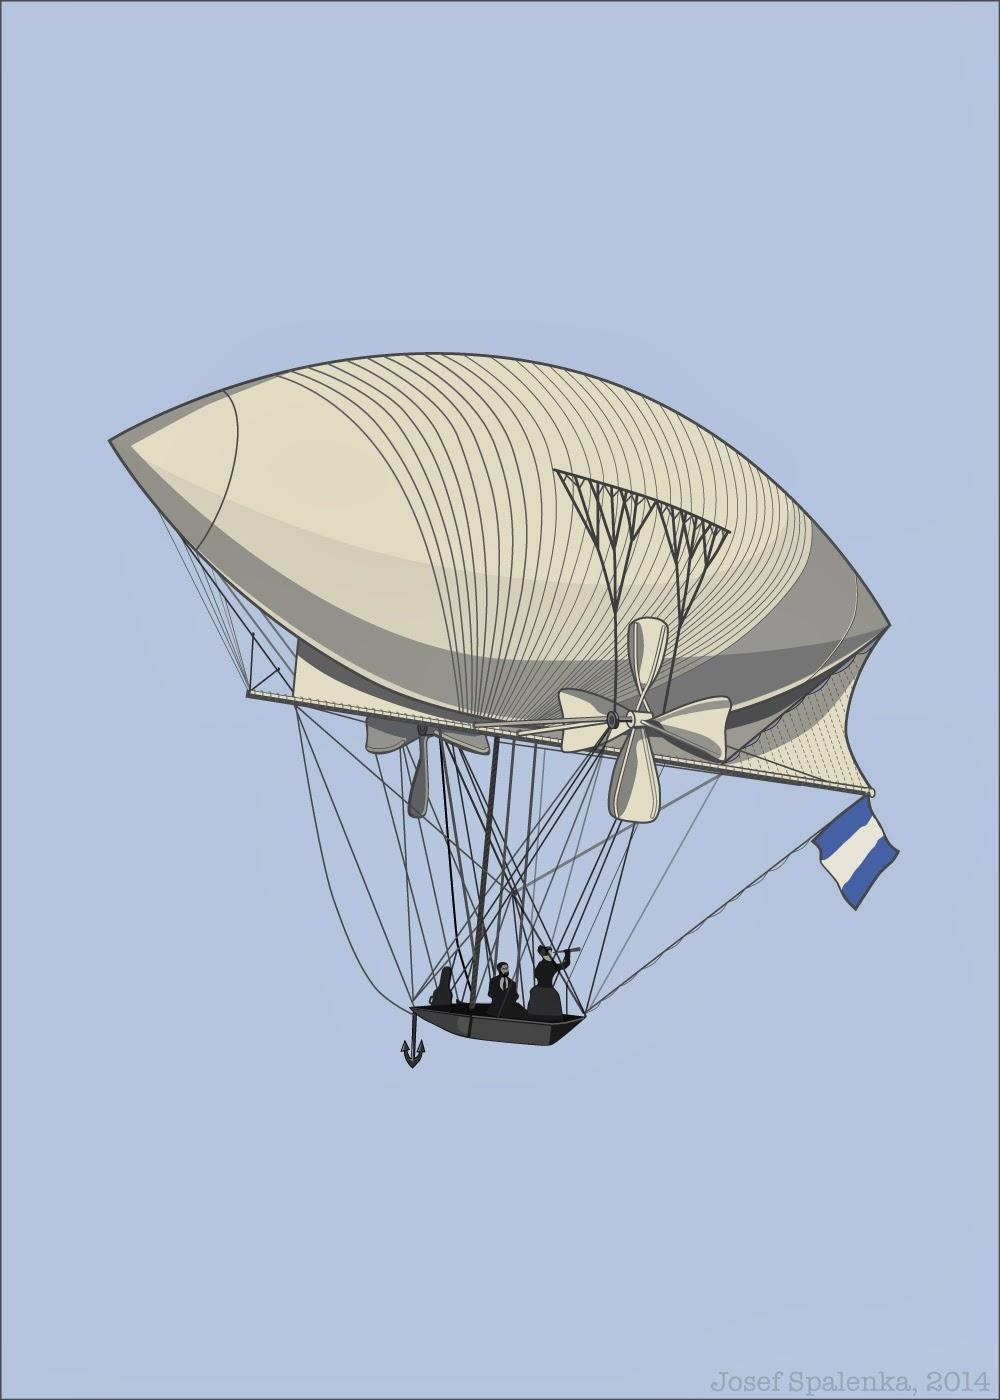 The Seeker victorian air ship dirigible adobe illustrator by Josef Spalenka 2014